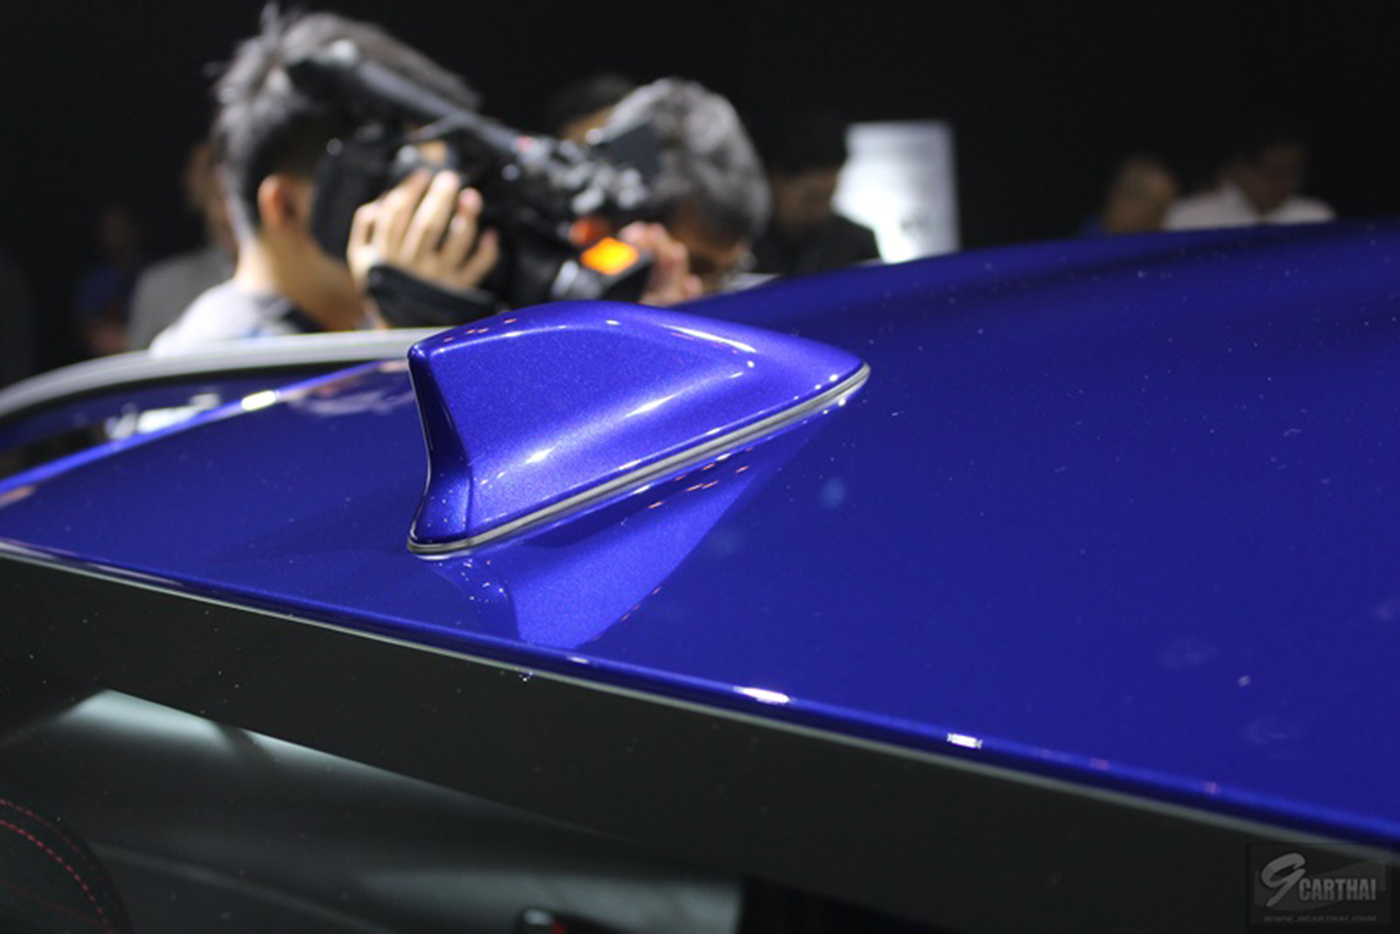 toyota-yaris-sedan-2018-9.jpg